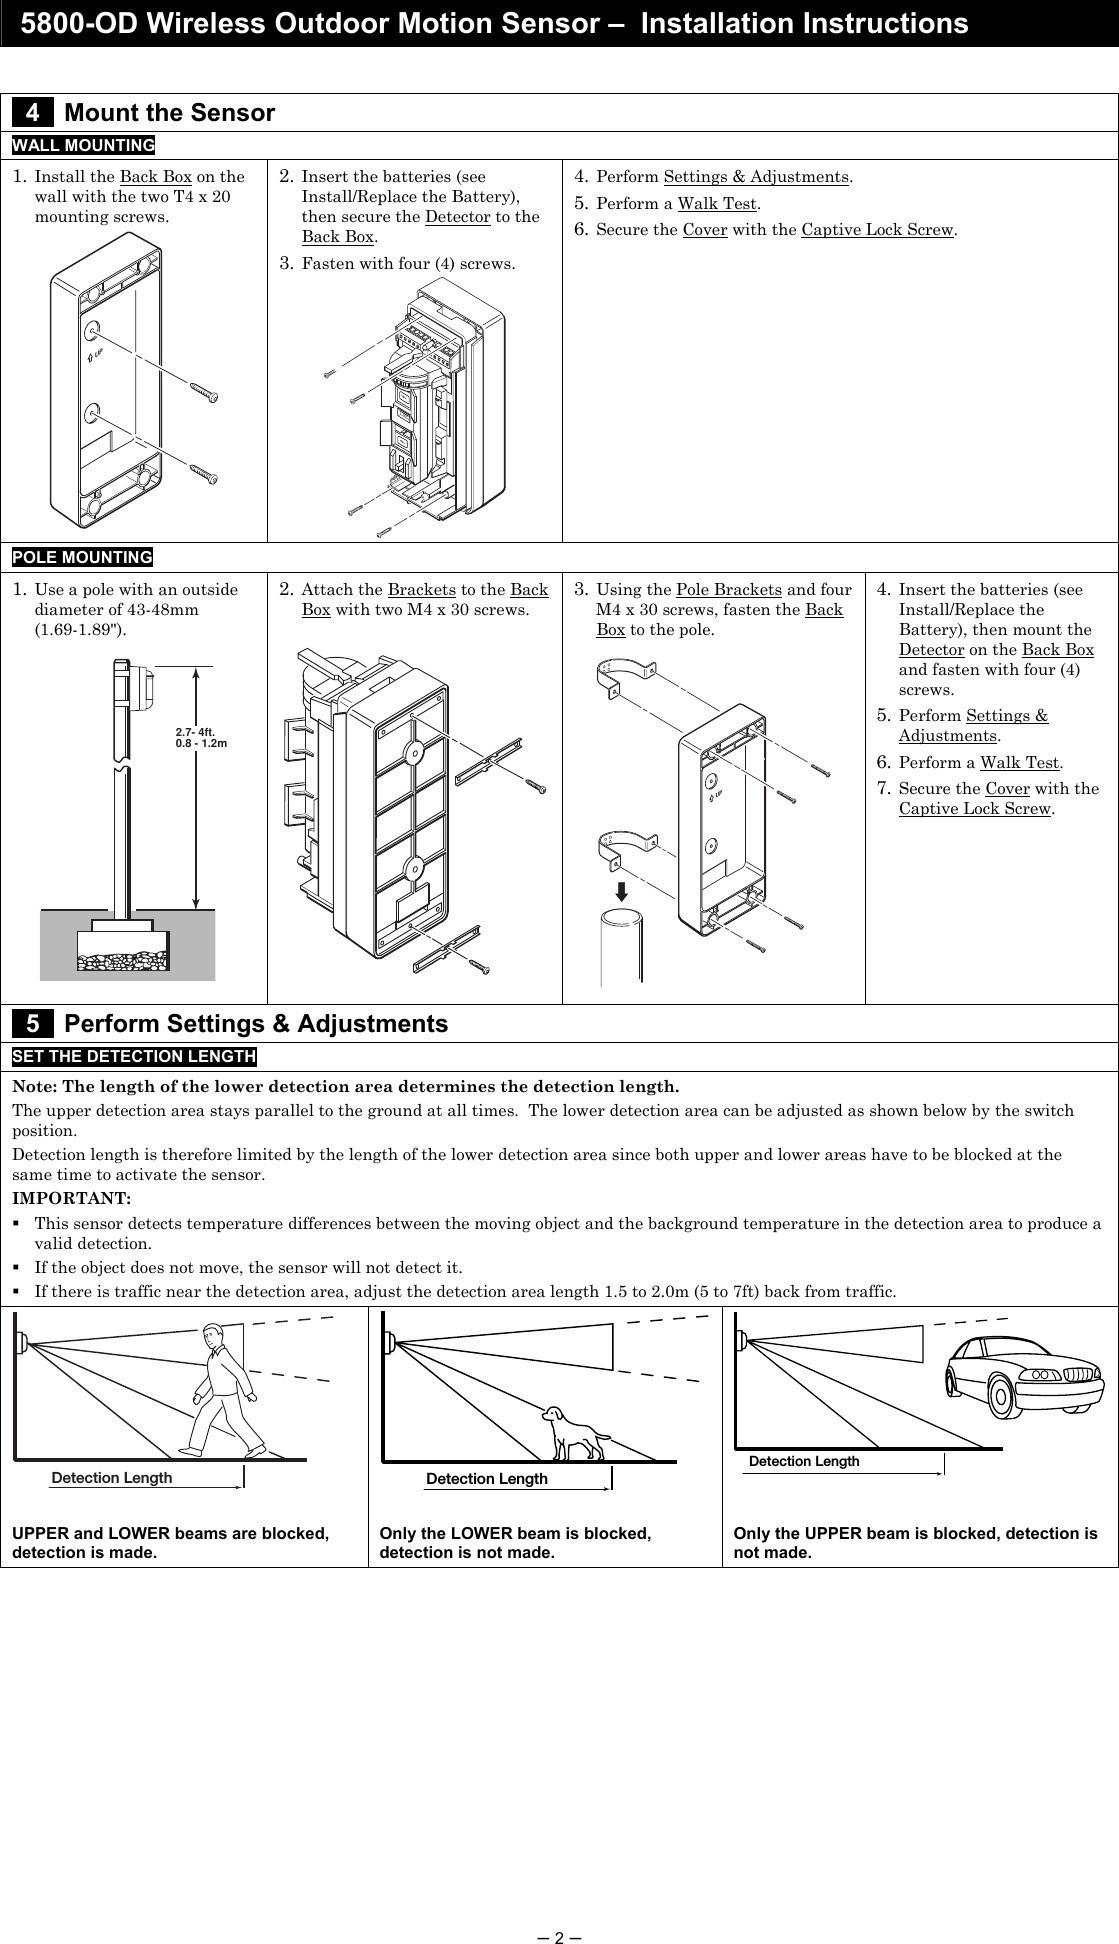 Steelmate Car Alarm Wiring Diagram Car Alarm Installation Wiring Diagram Viper Car Alarm Wiring Of Steelmate Car Alarm Wiring Diagram